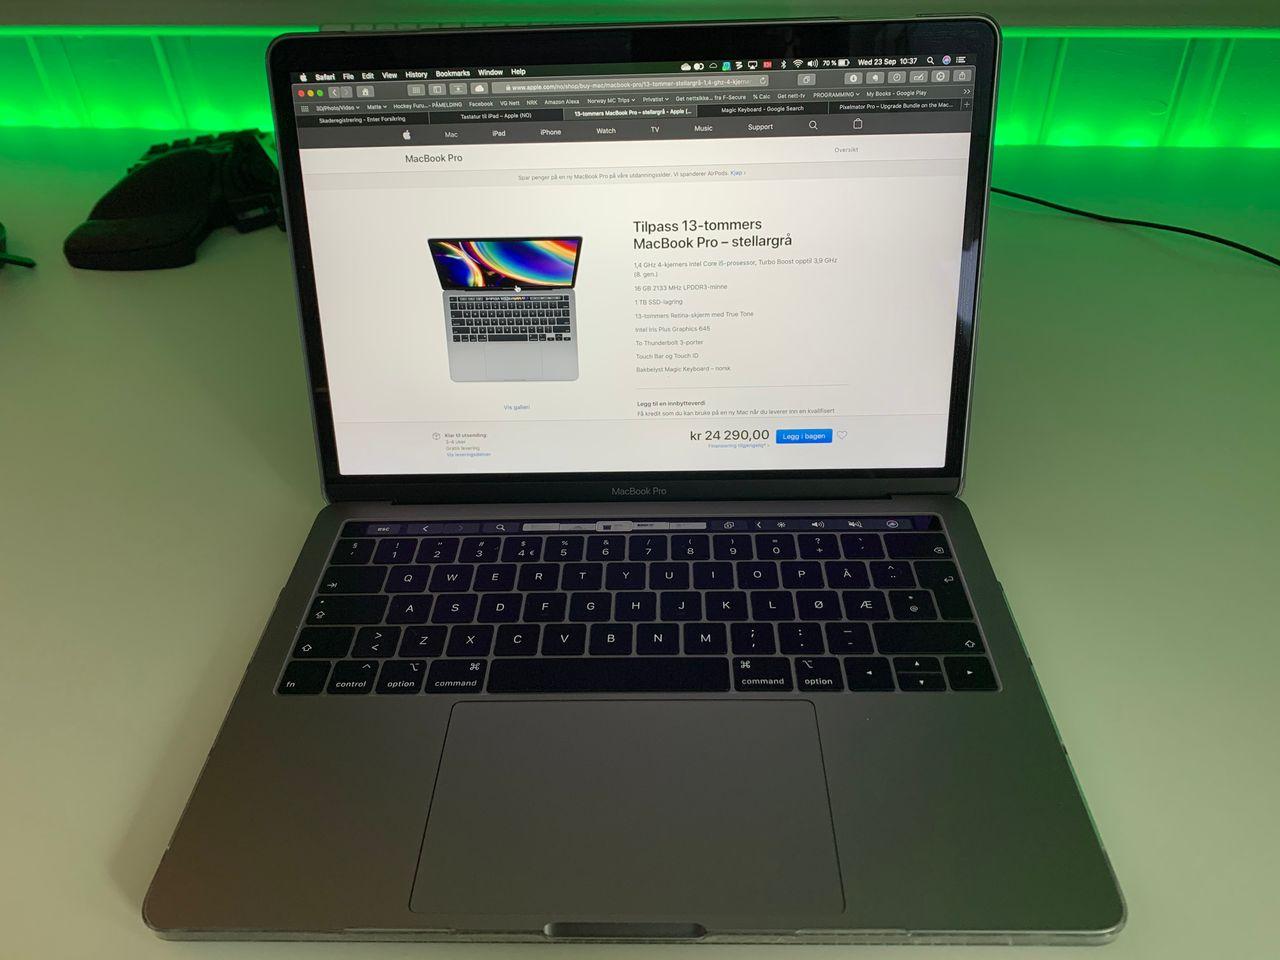 MacBook Pro (13 inch, 2017, Four Thunderbolt 3 Ports) | FINN.no